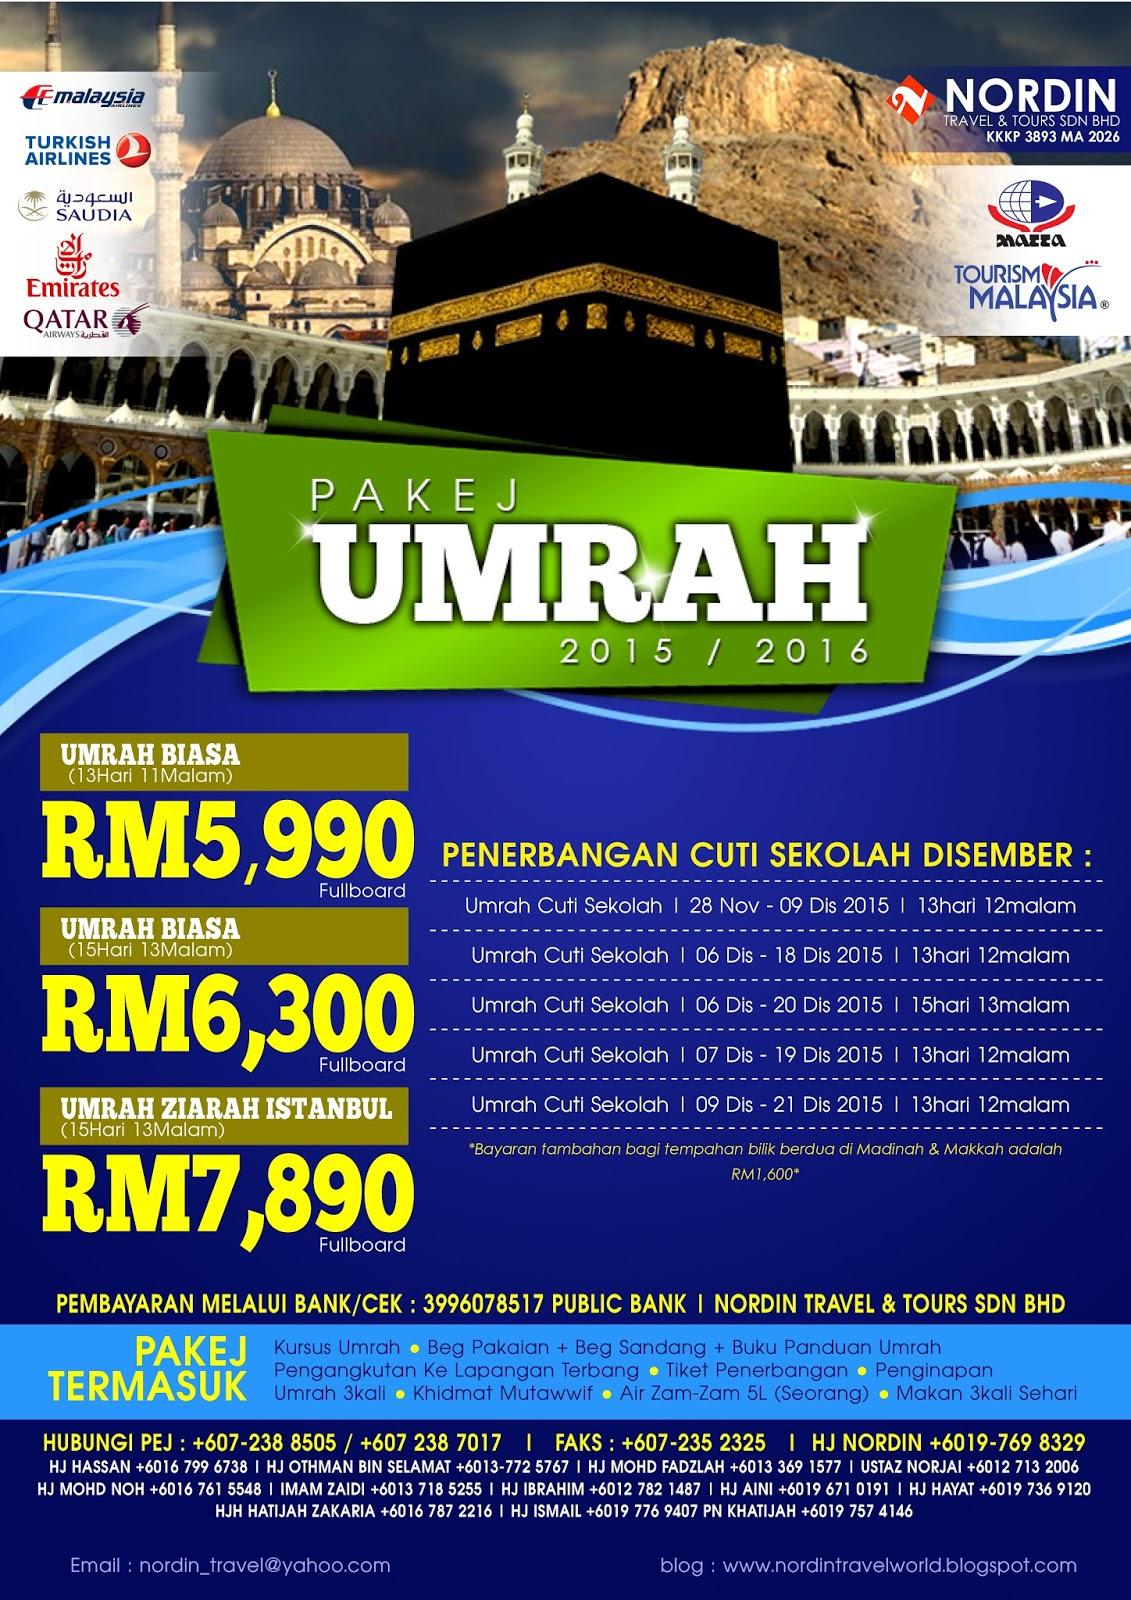 Edaran Travel Tours Sdn Bhd